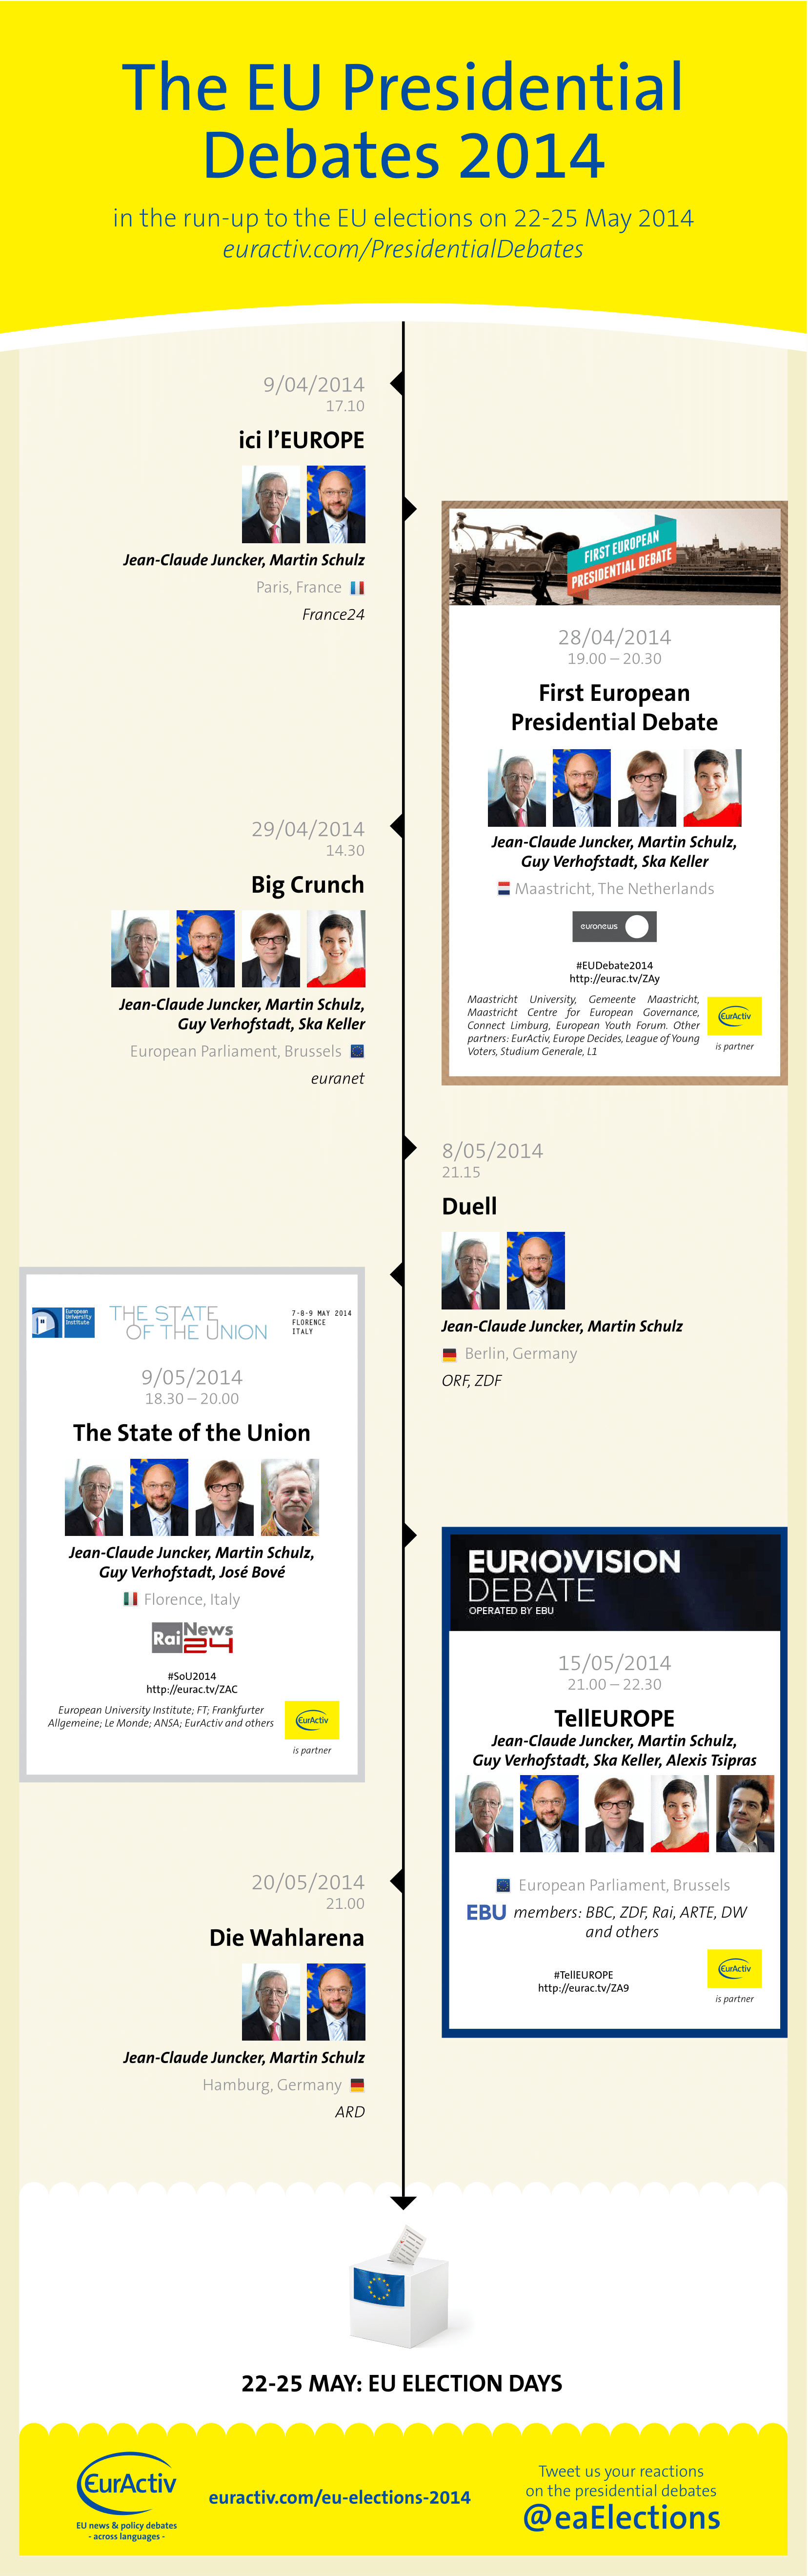 INFOGRAPHIC: EU Presidential Debates 2014